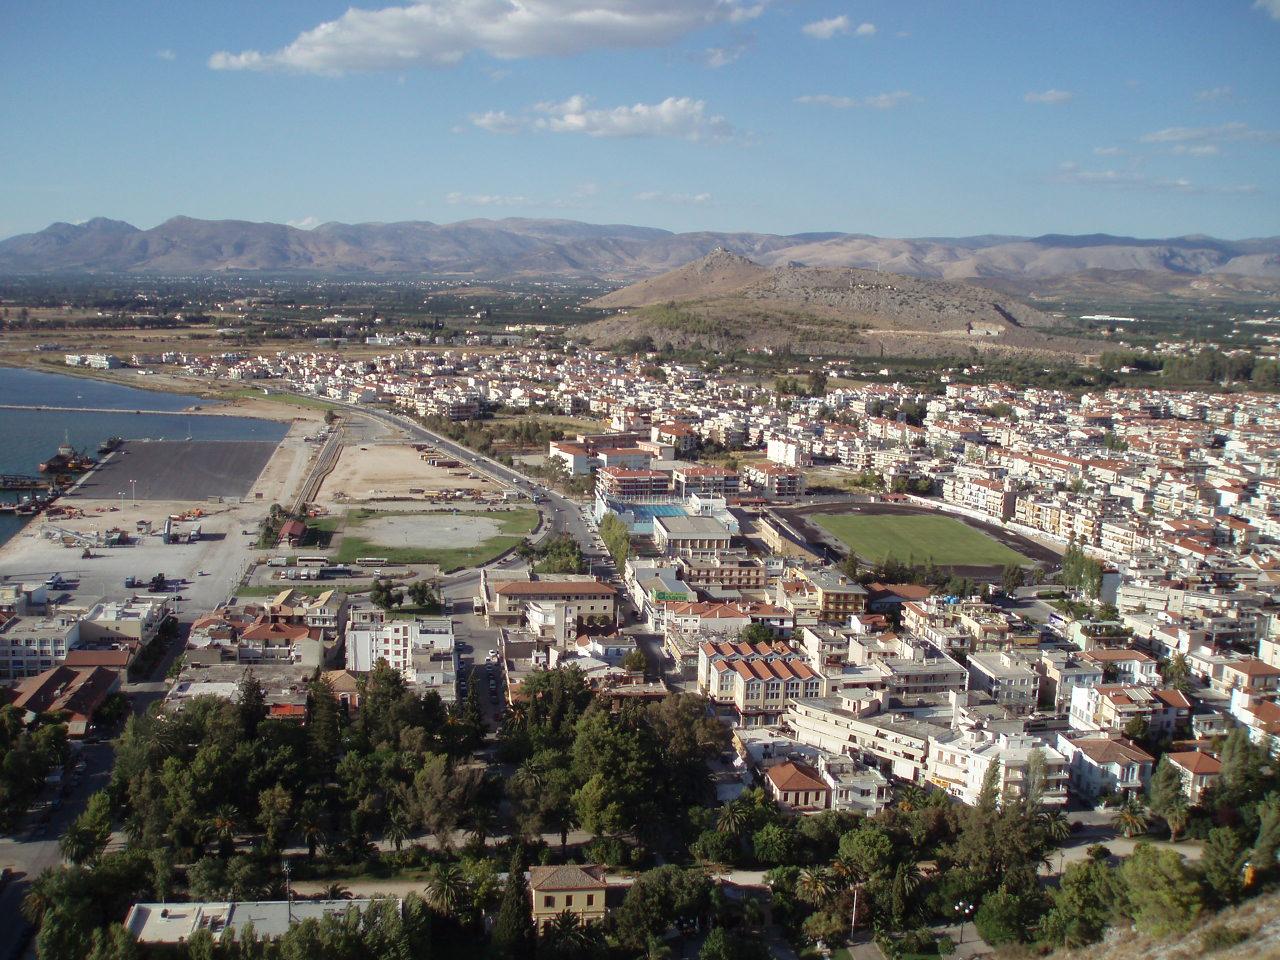 File:Nafplio (Nauplia), Argolis (Argolida), Greece. View ...